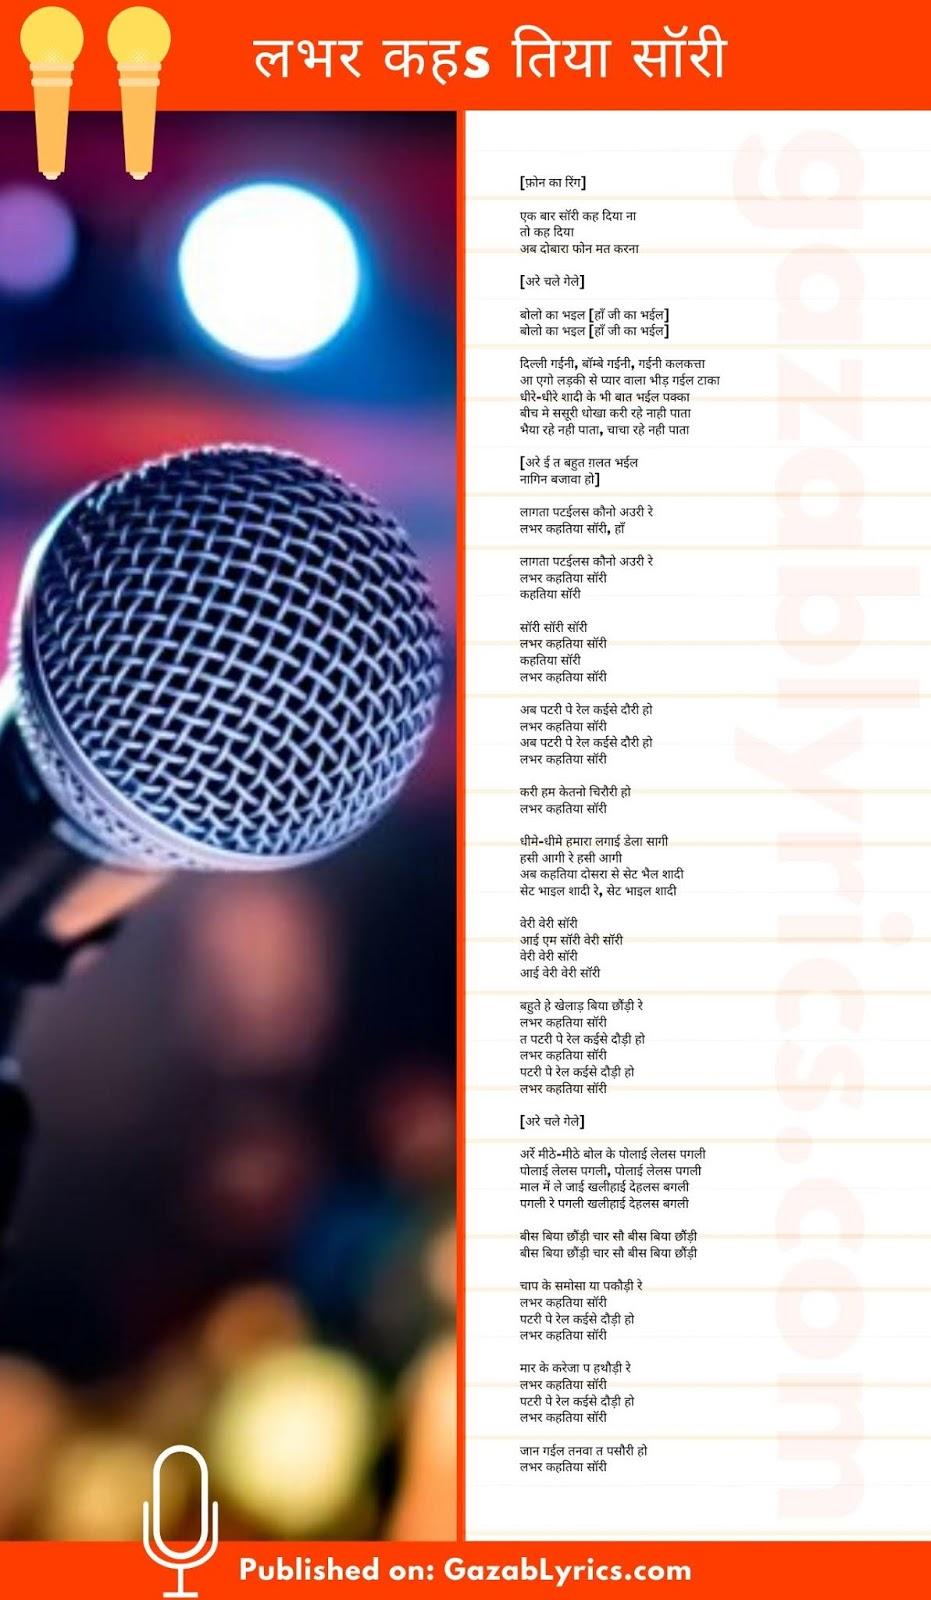 Lobher Kehtiya Sorry song lyrics image